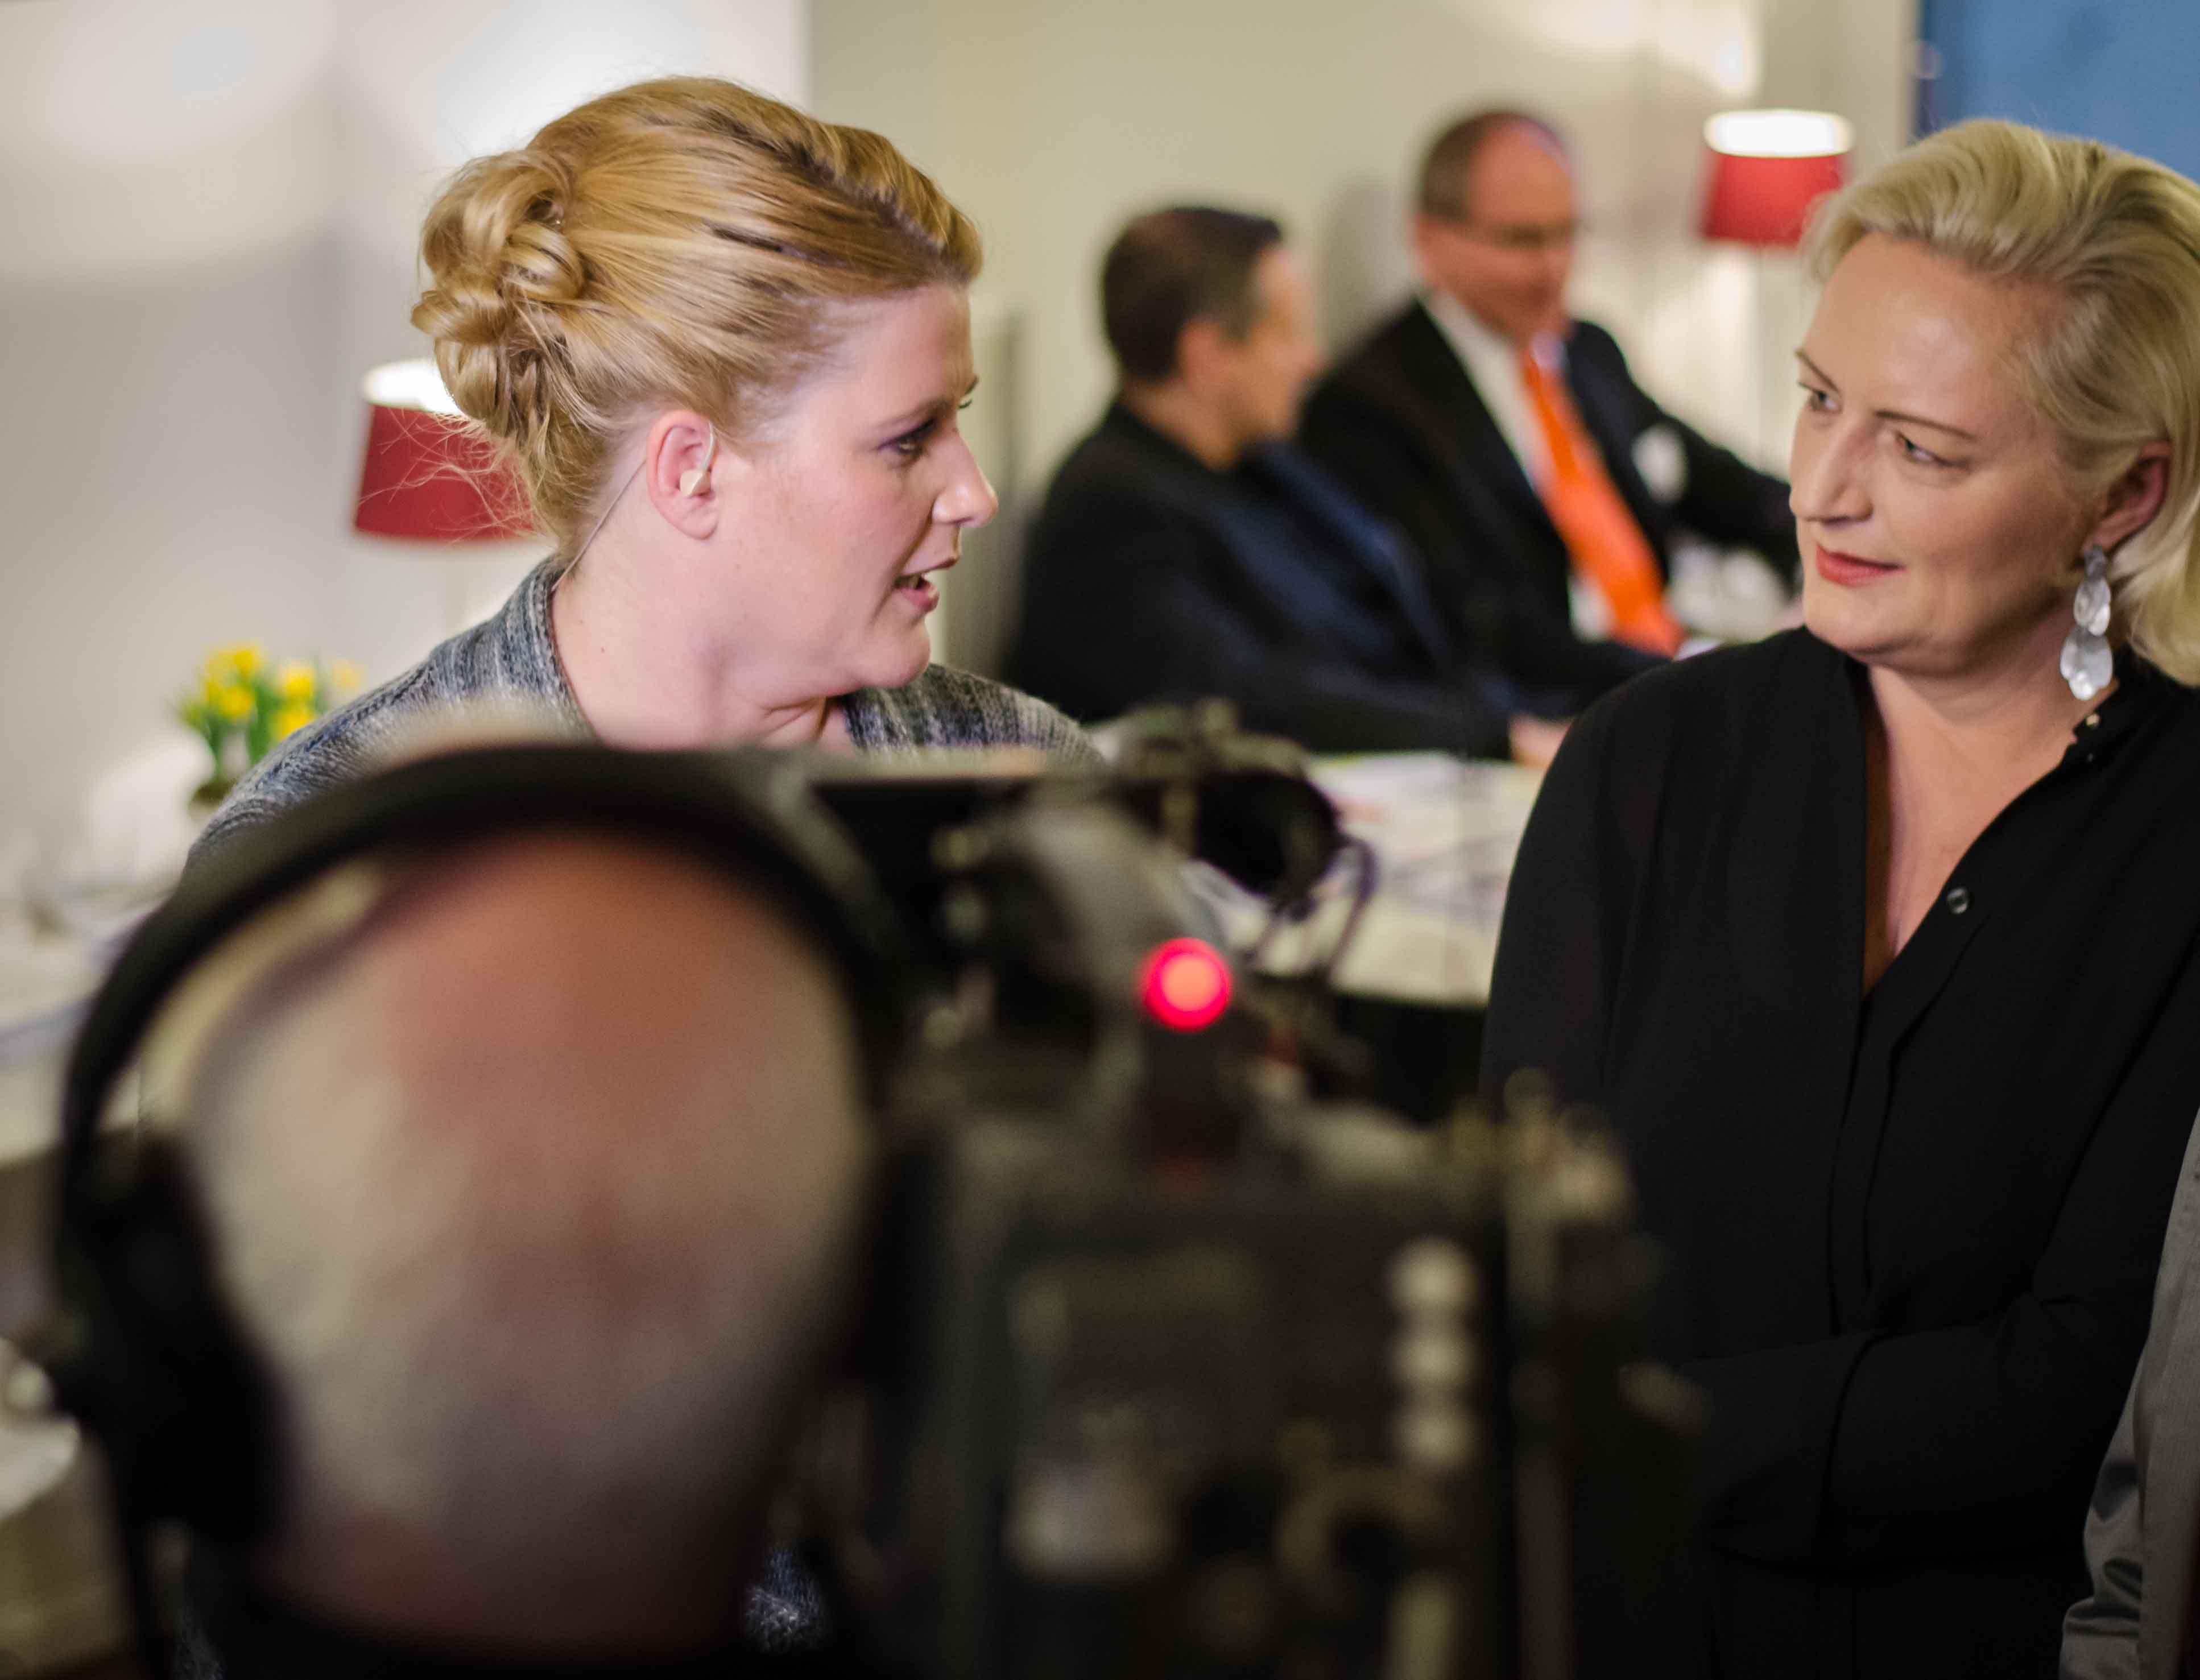 TV Live - Im Gespräch mit Anke Harnack